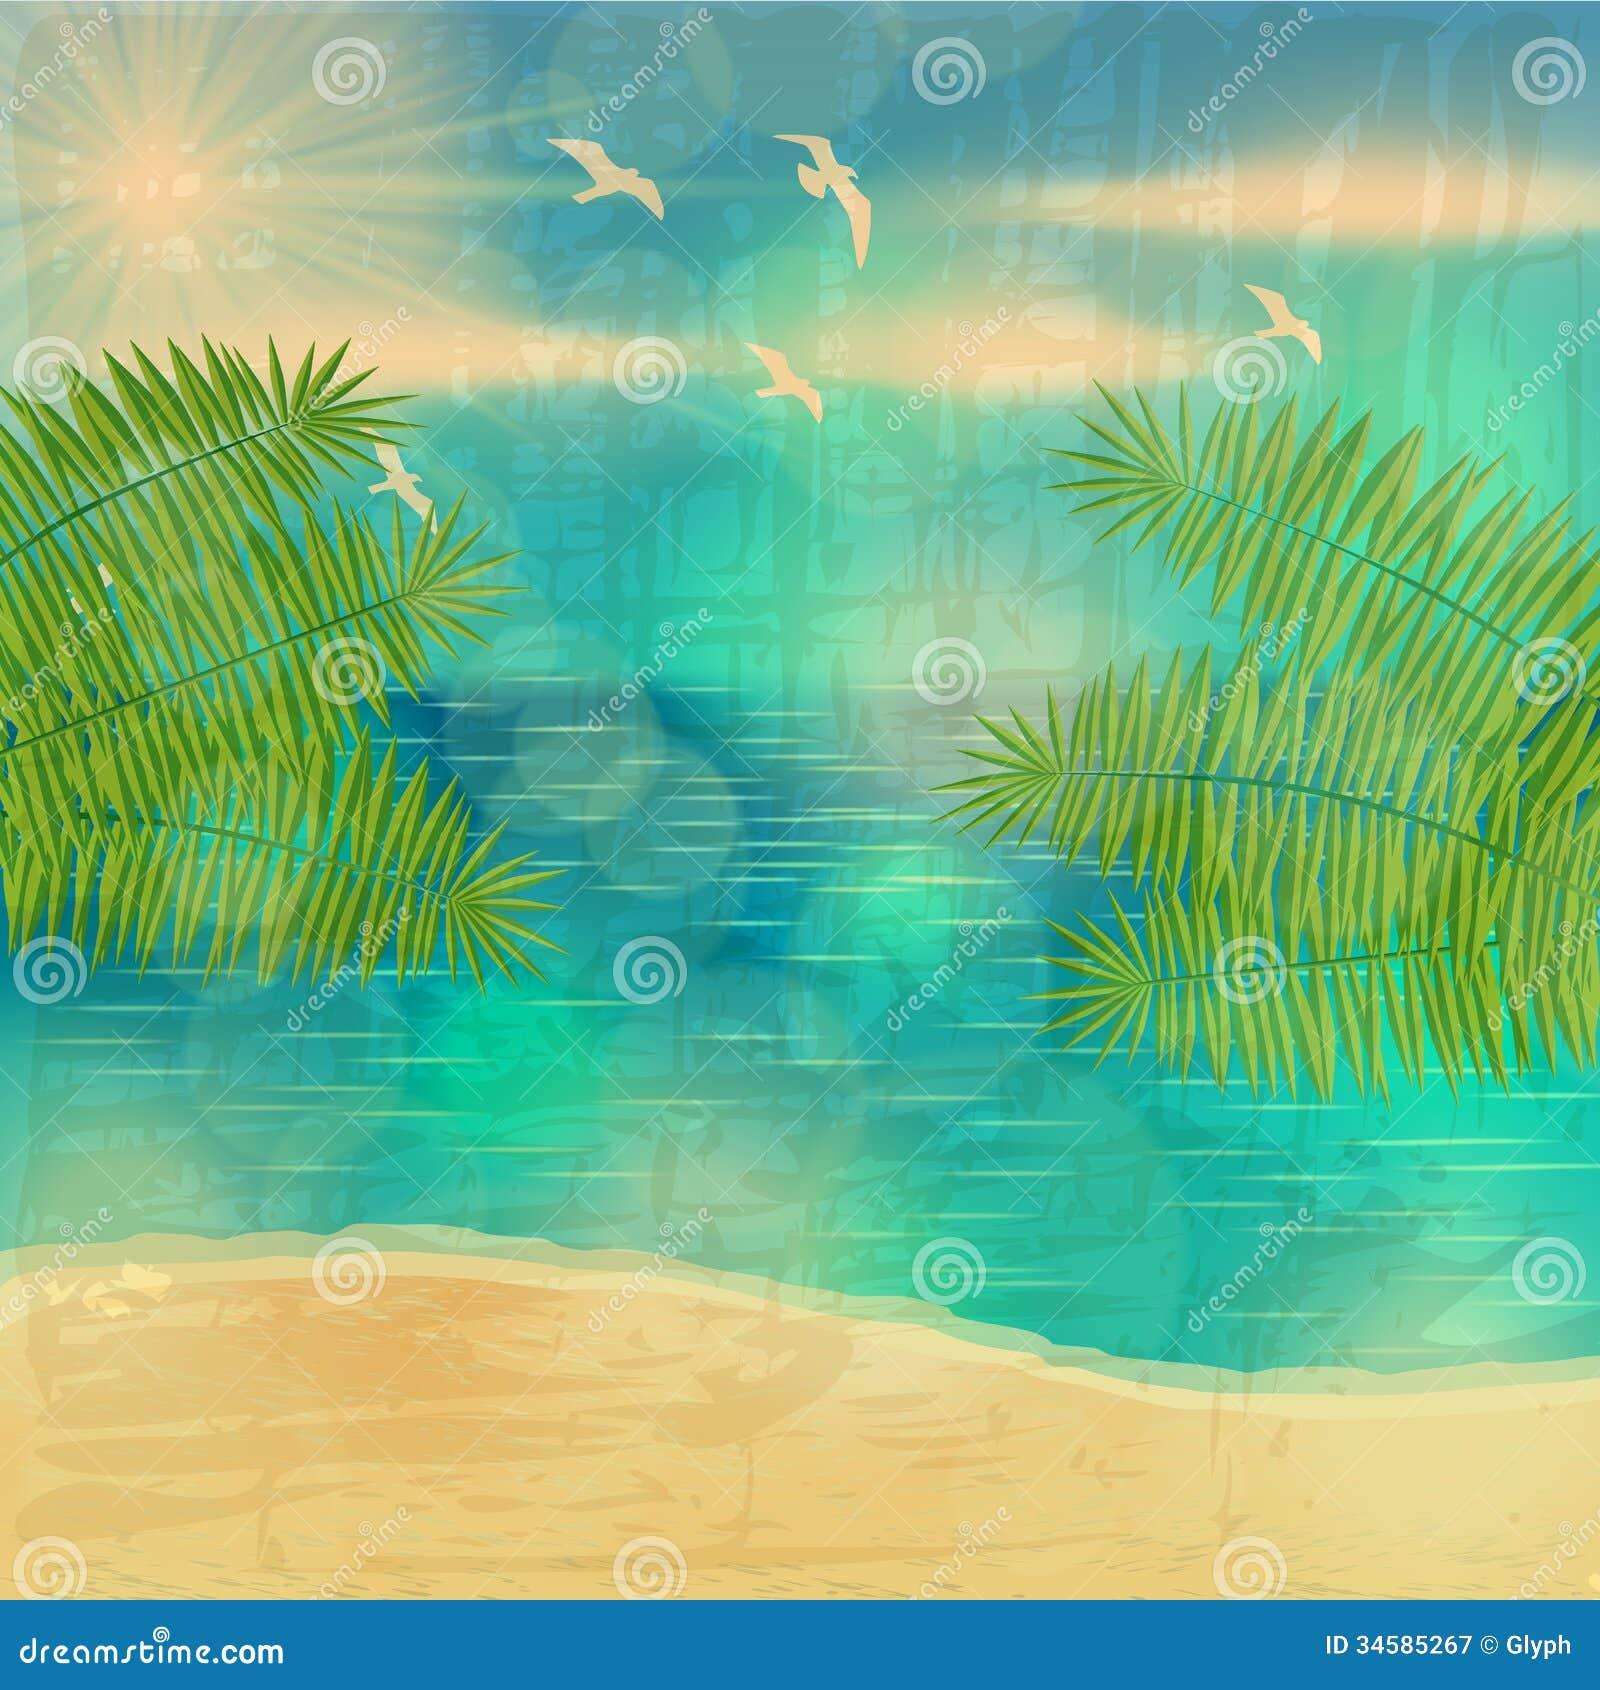 Beautiful Vintage Summer Seaside Illustration Royalty Free ...